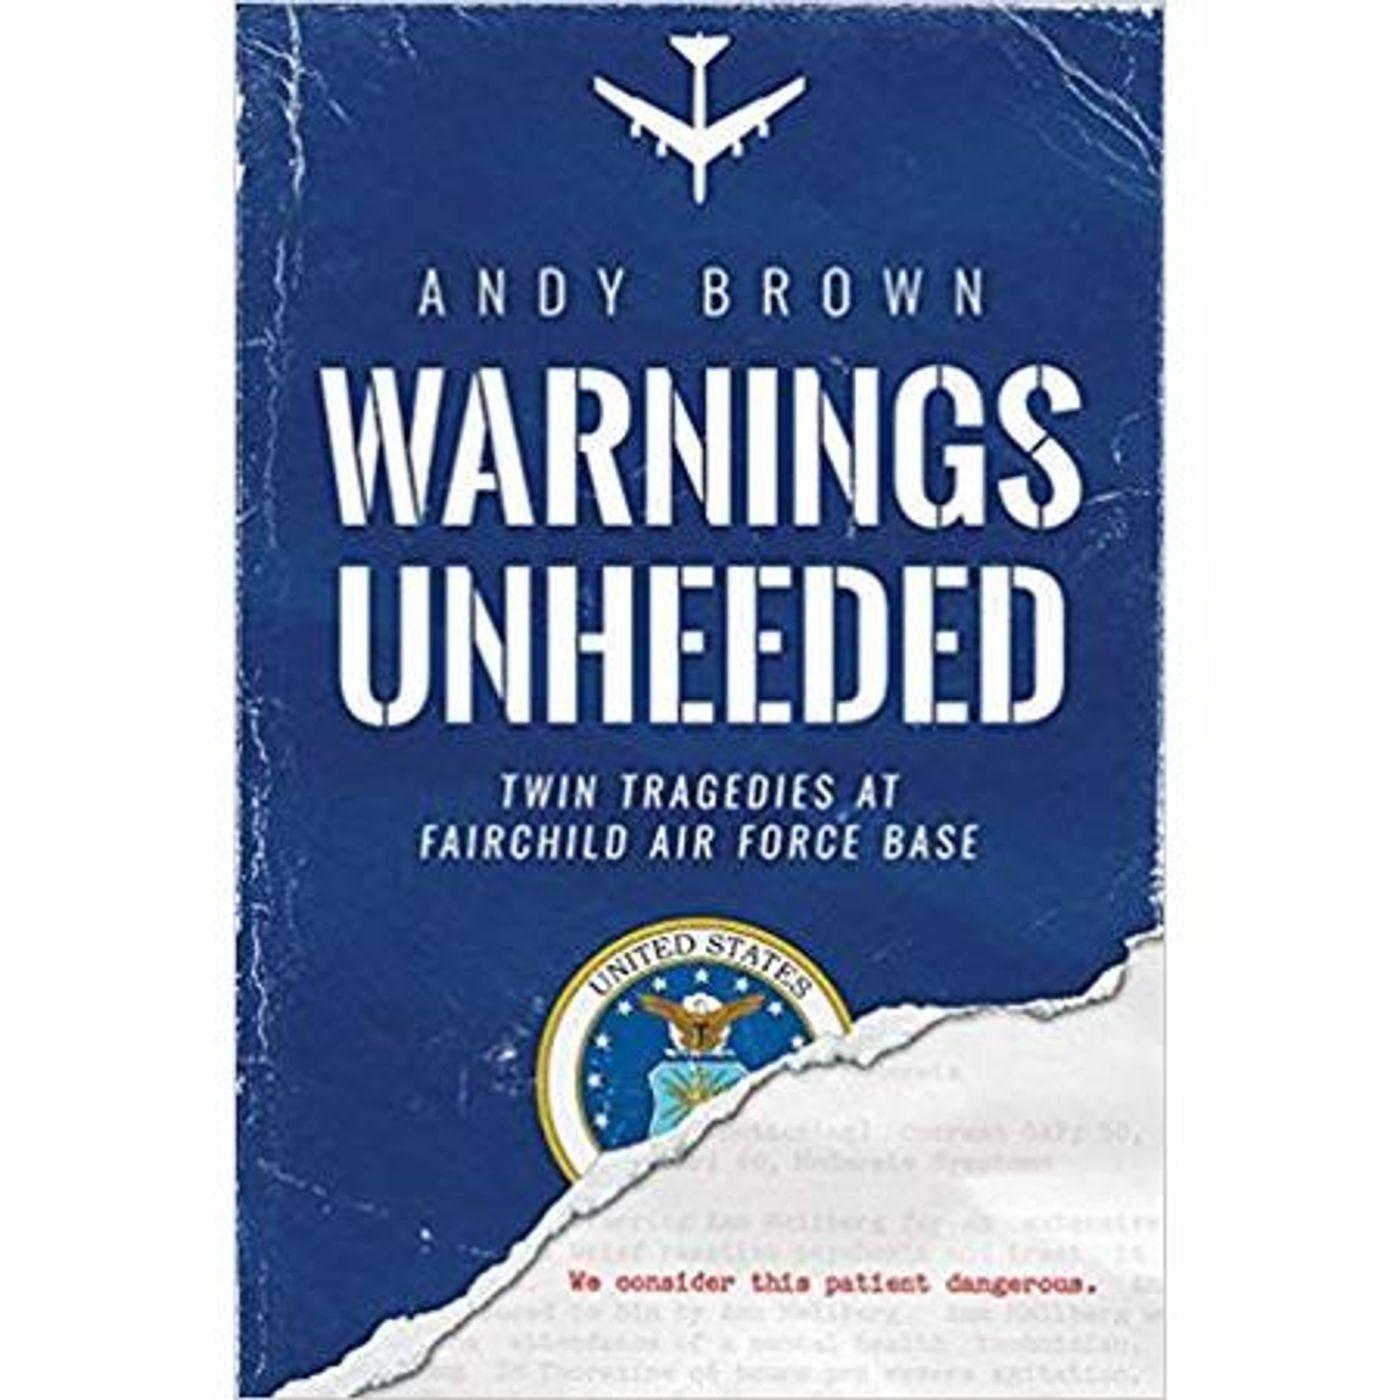 WARNINGS UNHEEDED-Andy Brown